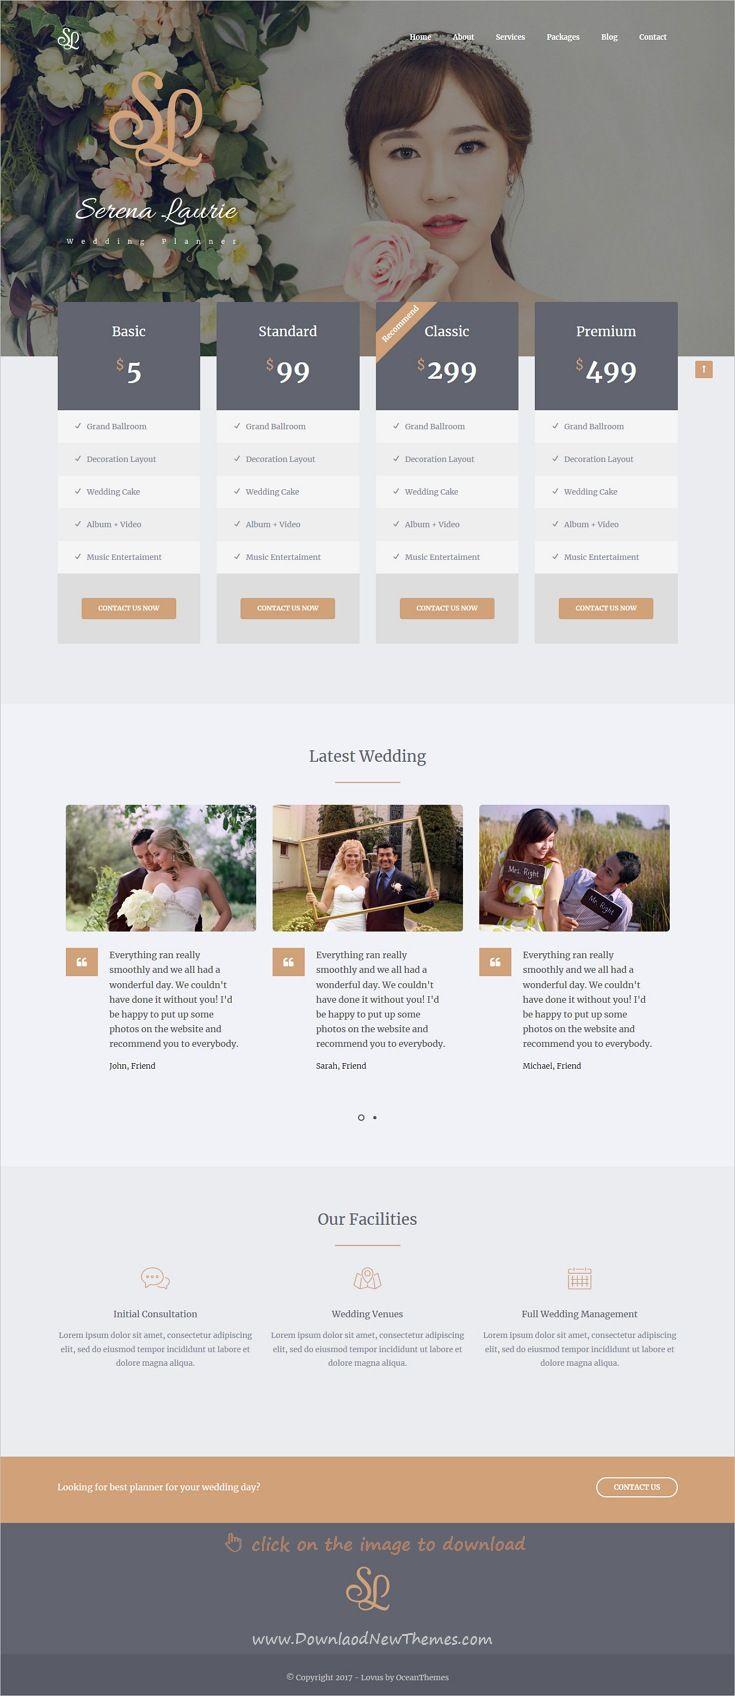 Lovus - Wedding Planner WordPress Theme | Wedding planners, Planners ...